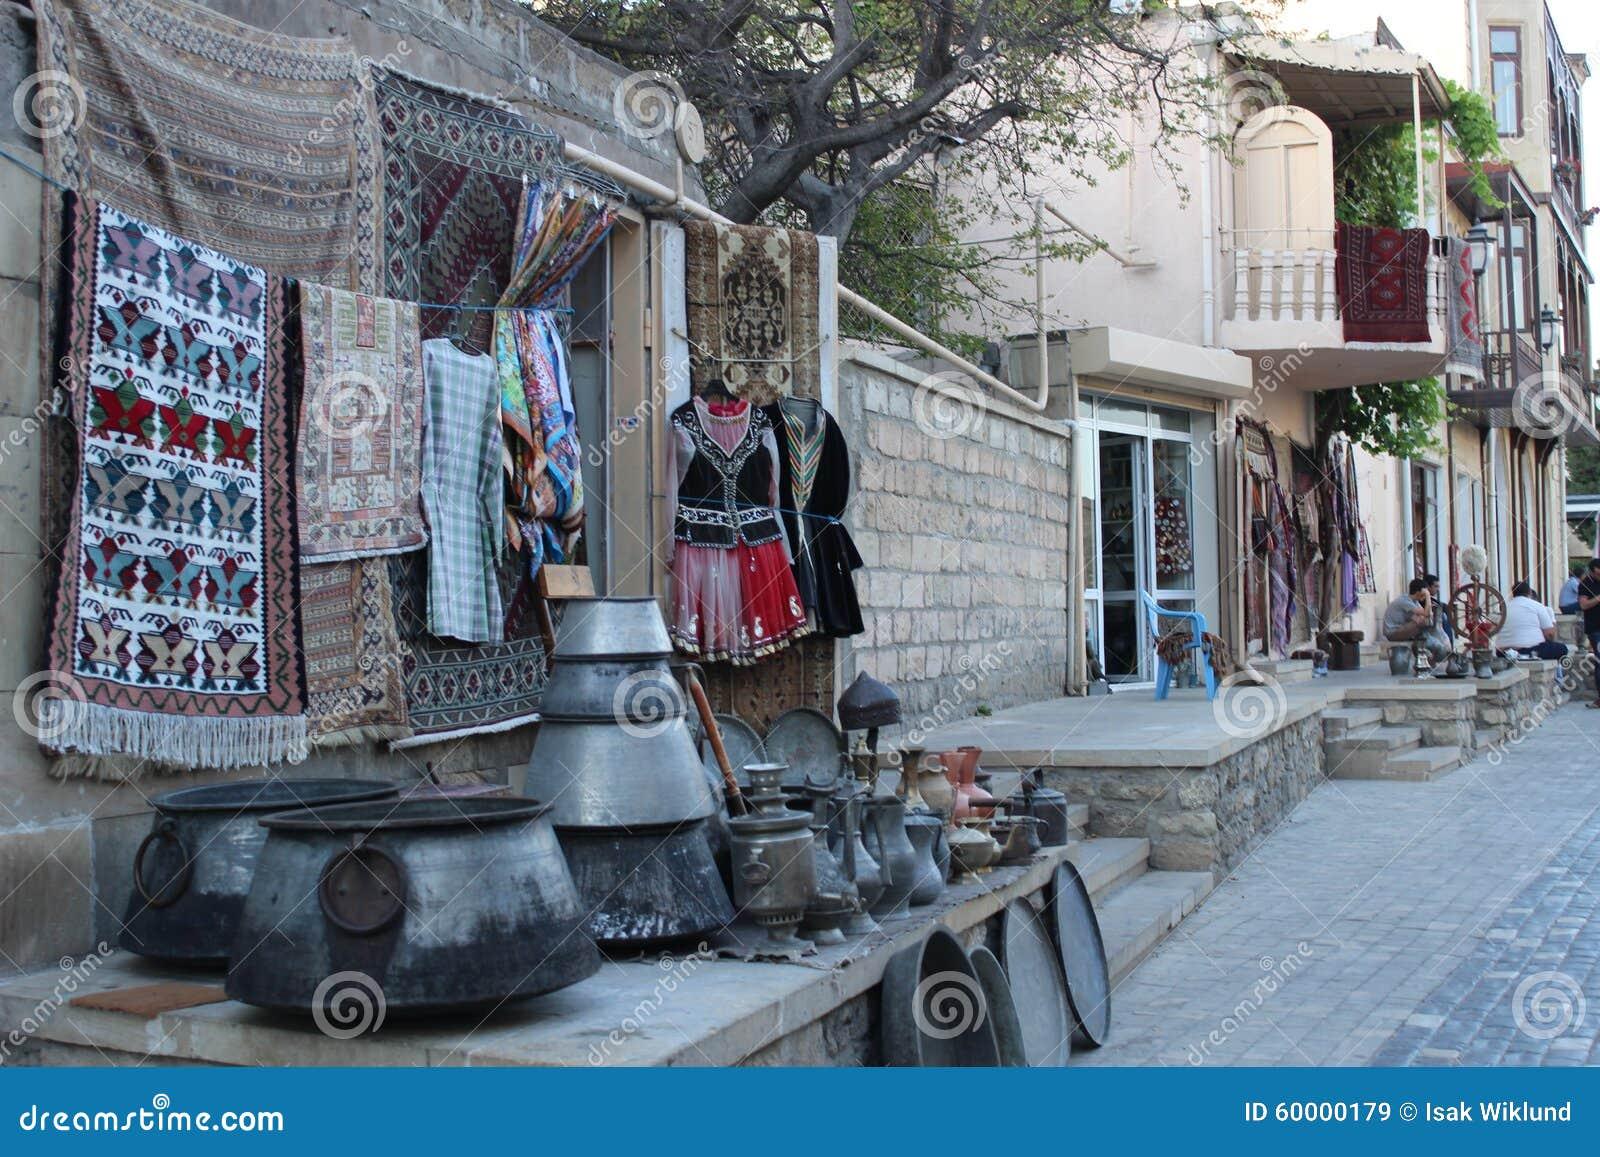 Souvenir stand in Baku old town